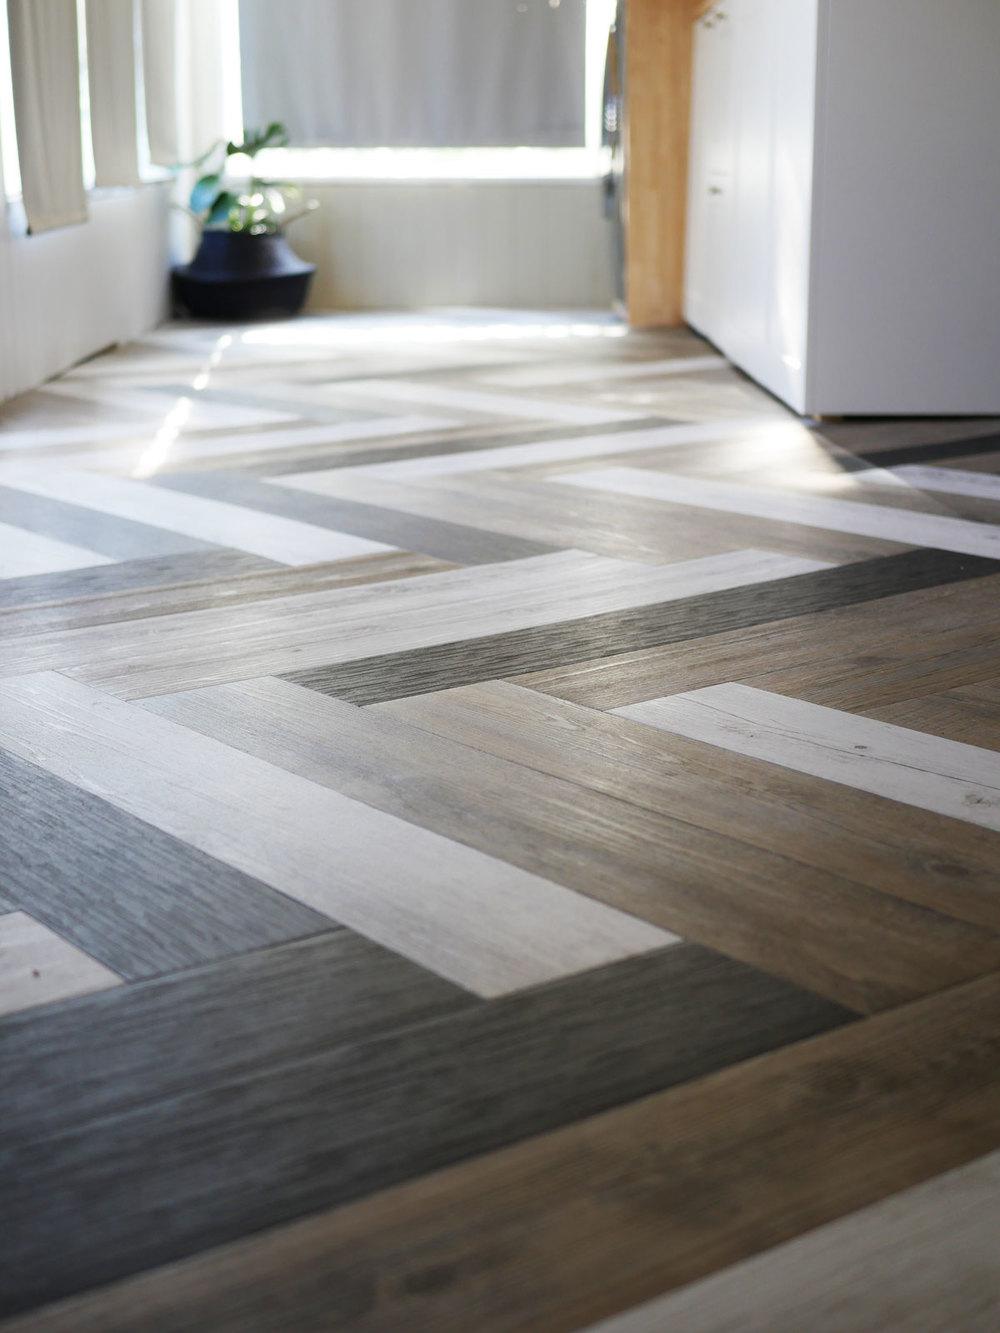 Vinyl Stick Down Planks, Stick Together Laminate Flooring